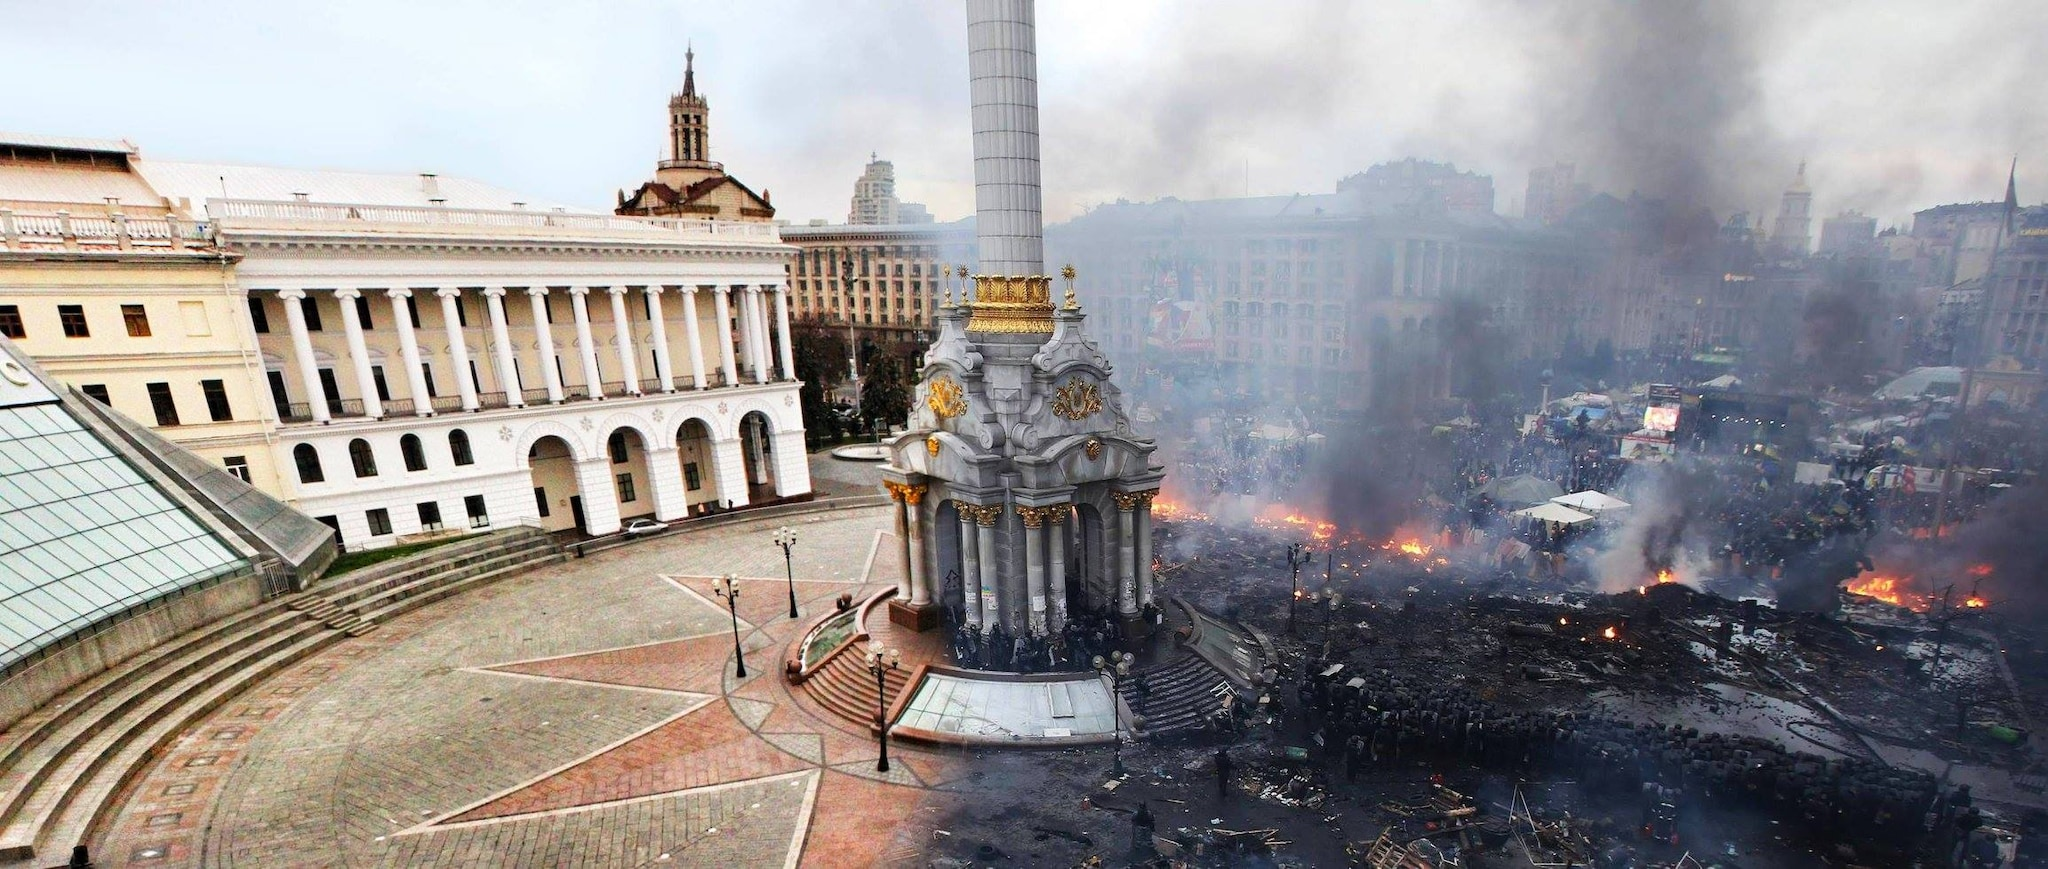 kiev ukraine before after